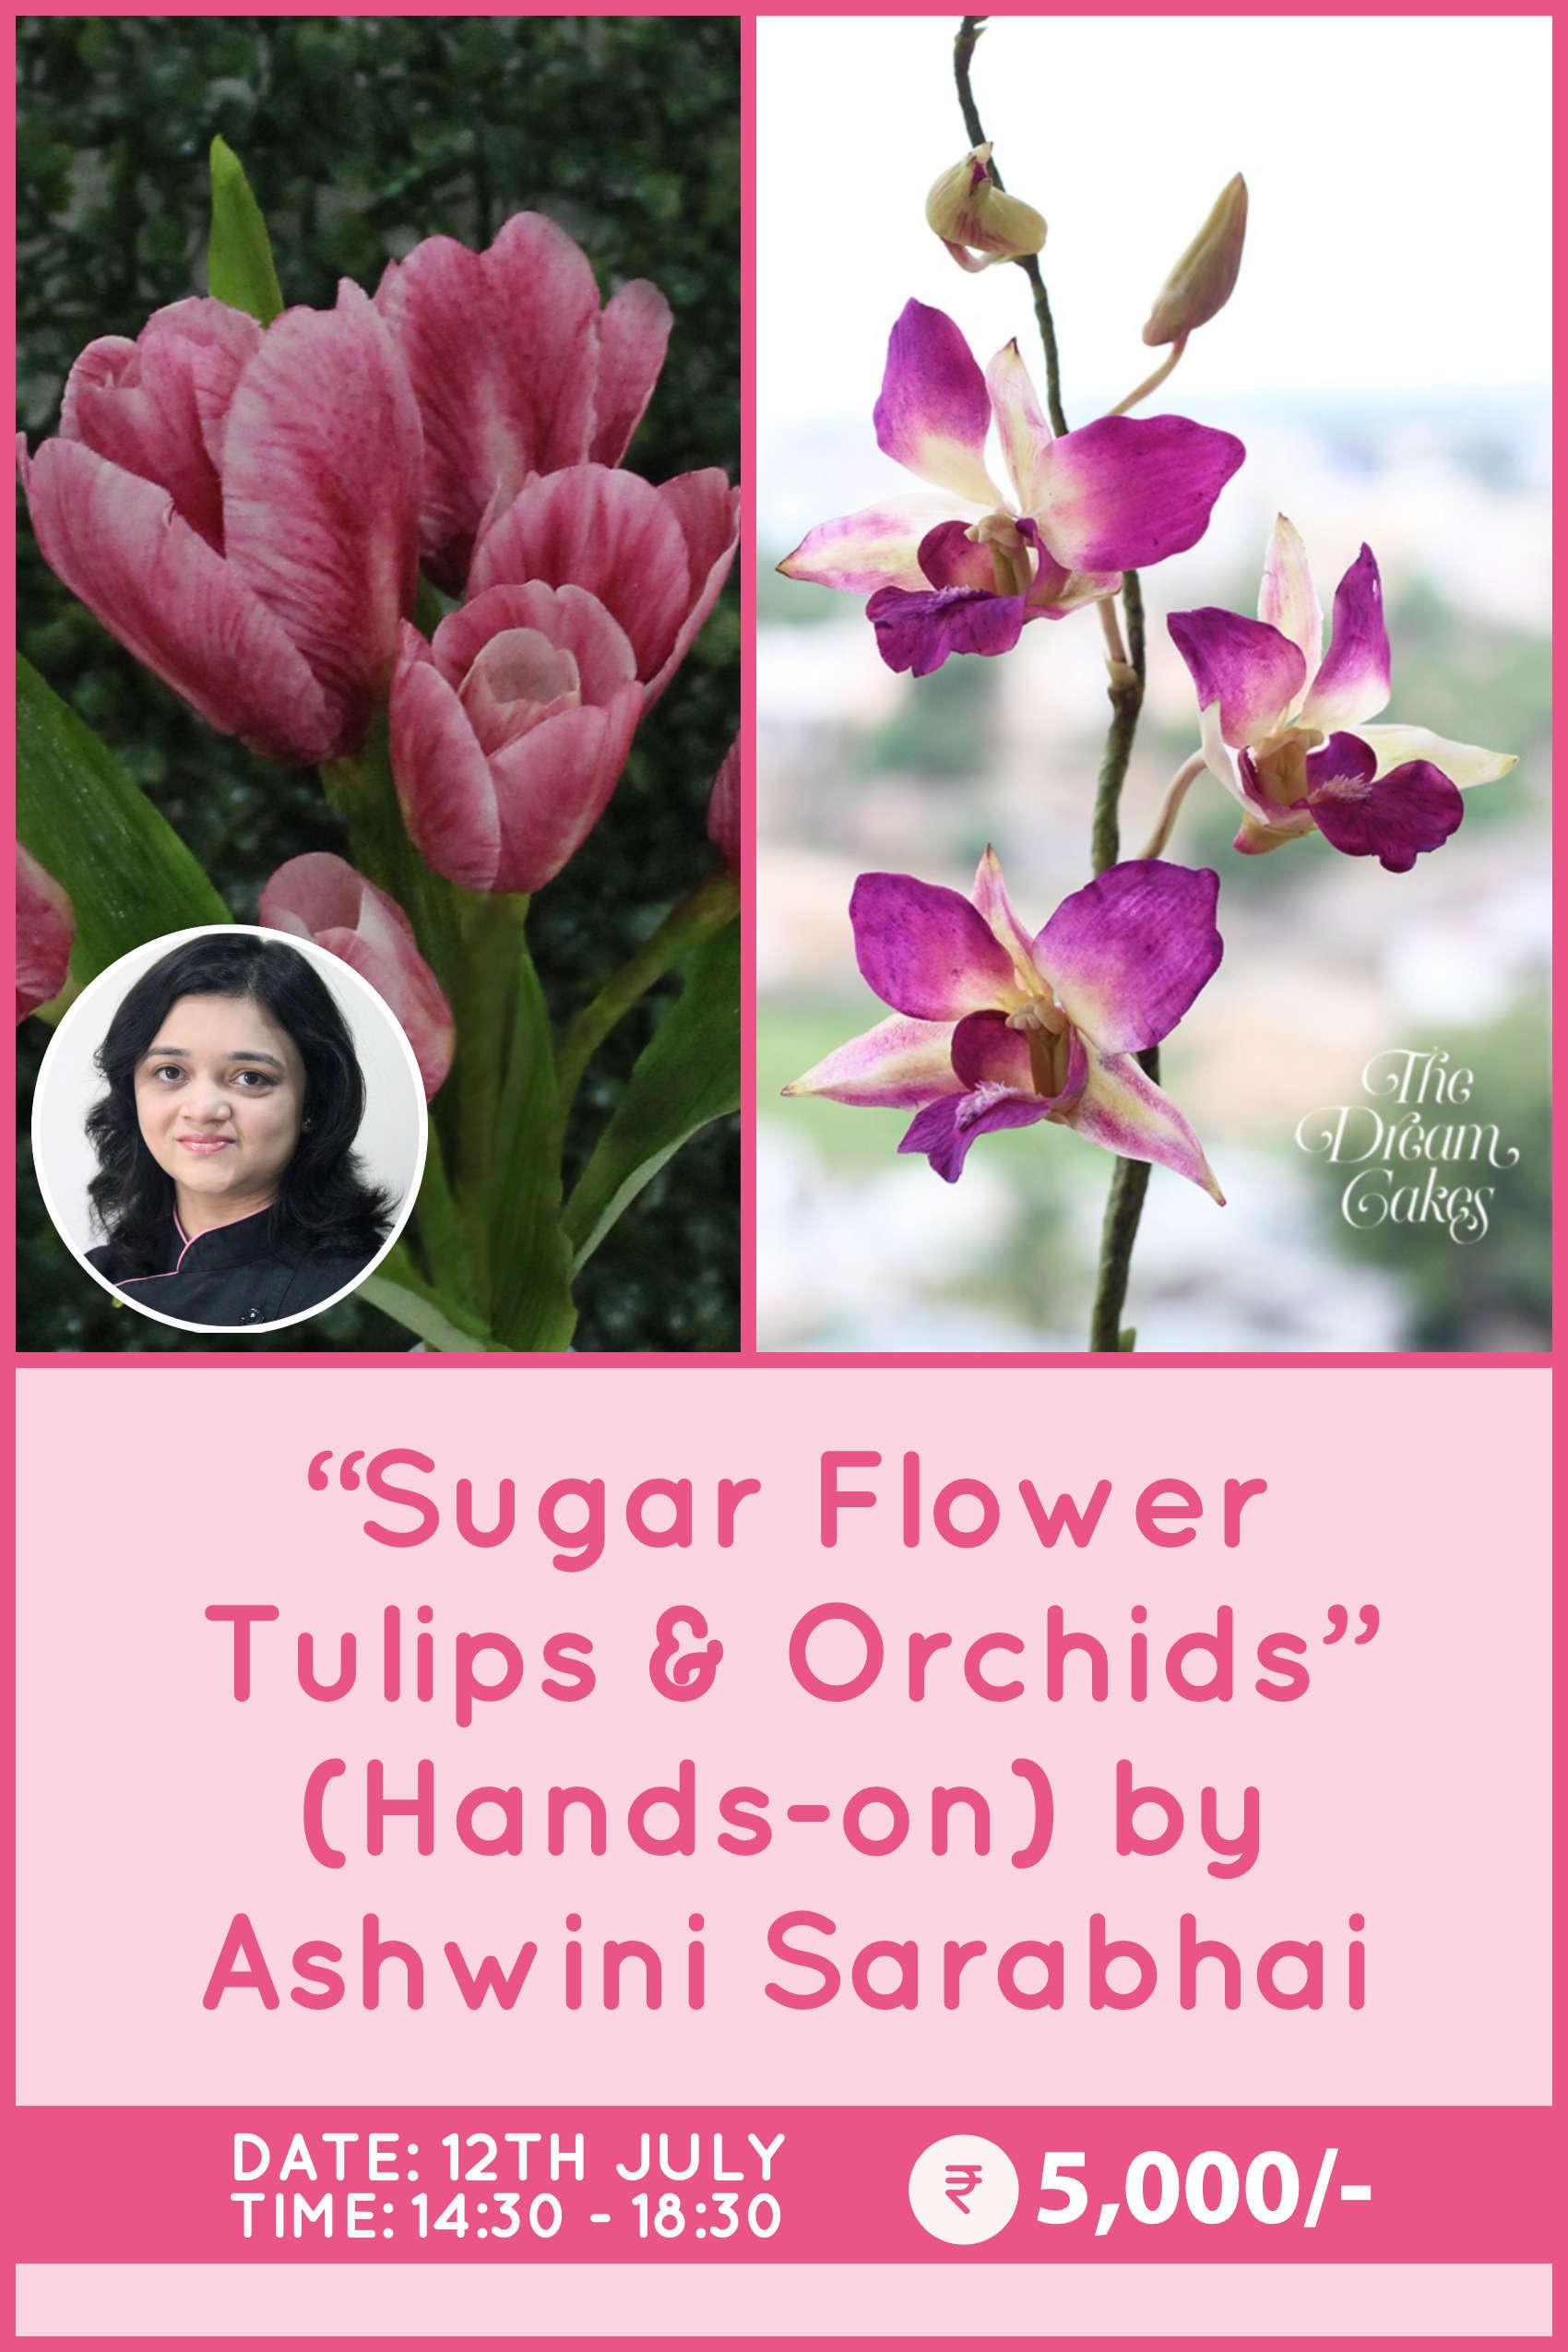 Sugar Flower Tulips & Orchids by Ashwini Sarabhai